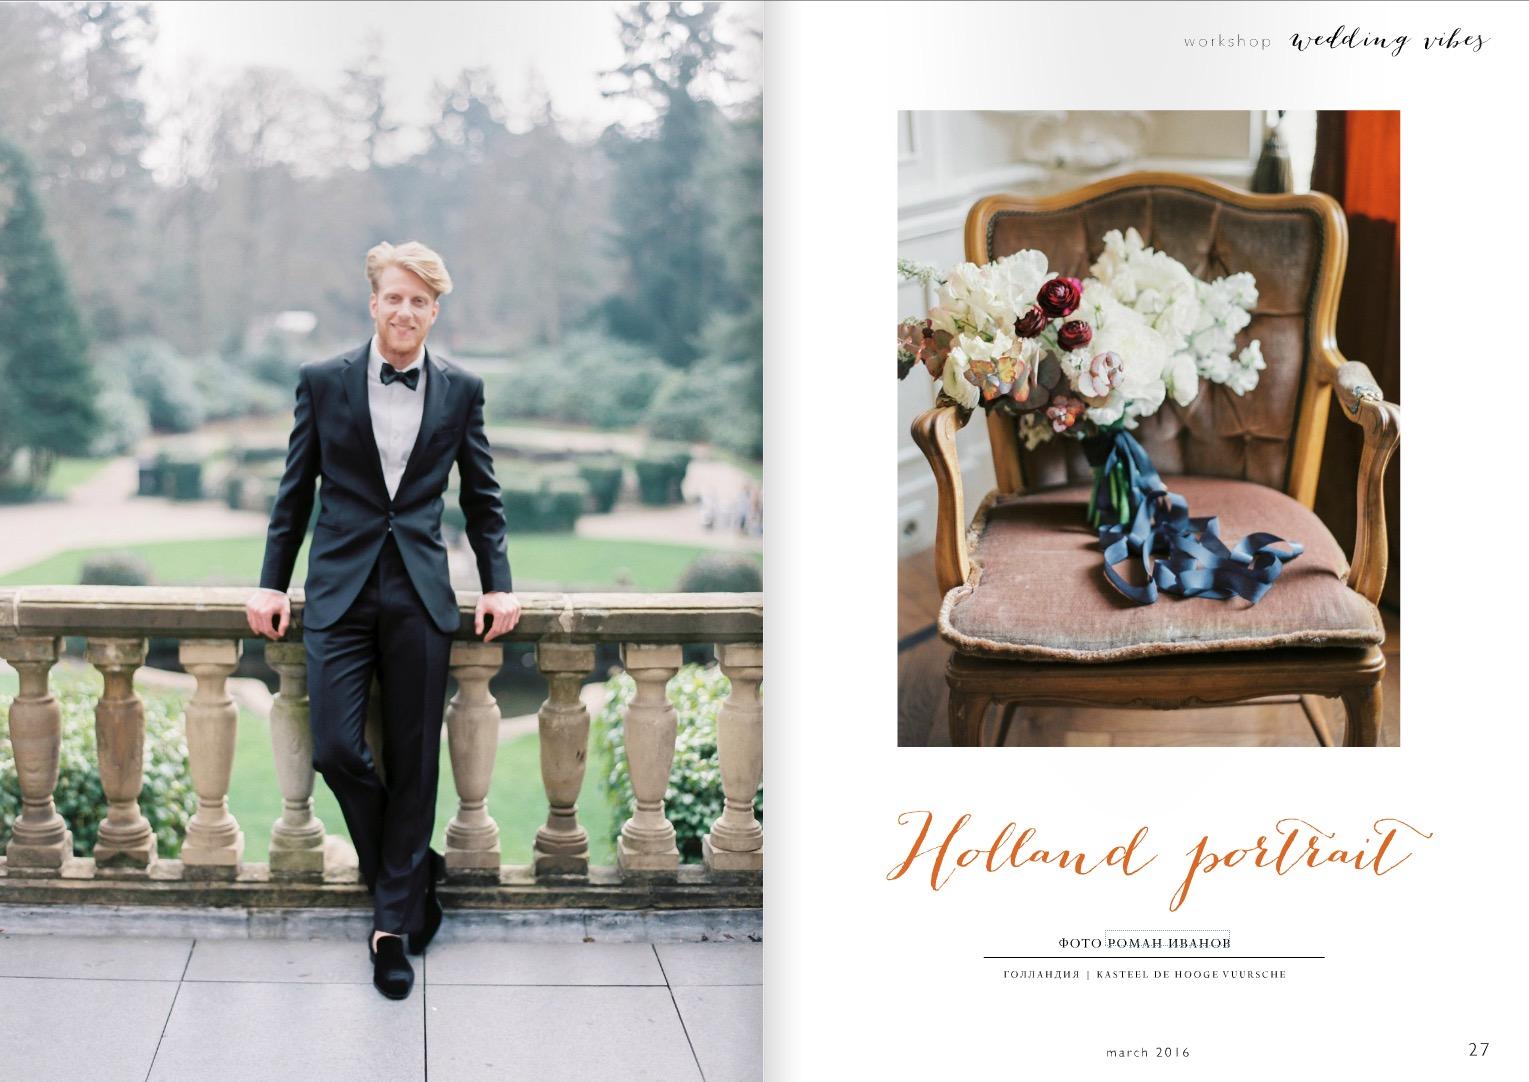 March 2016,  Wed Vibes magazine , Holland Portrait https://issuu.com/weddingvibes/docs/issue_4